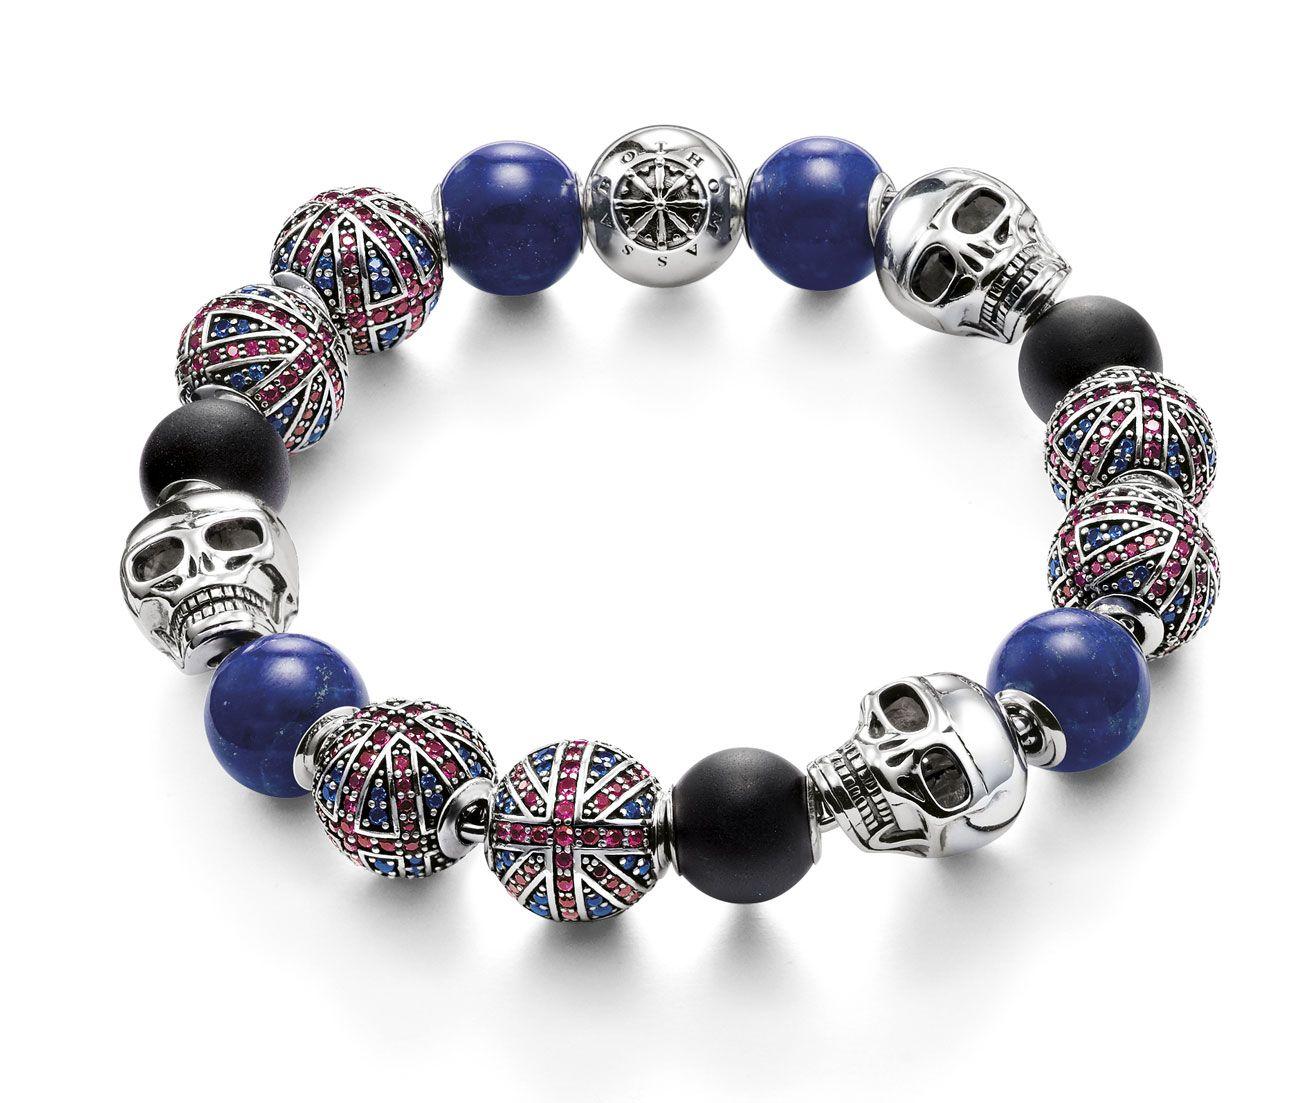 Cool Punk Attitude: Skulls Plus Union Jack The Karma Beads – Crafted From  Black · Mens Jewellerythomas Sabounion